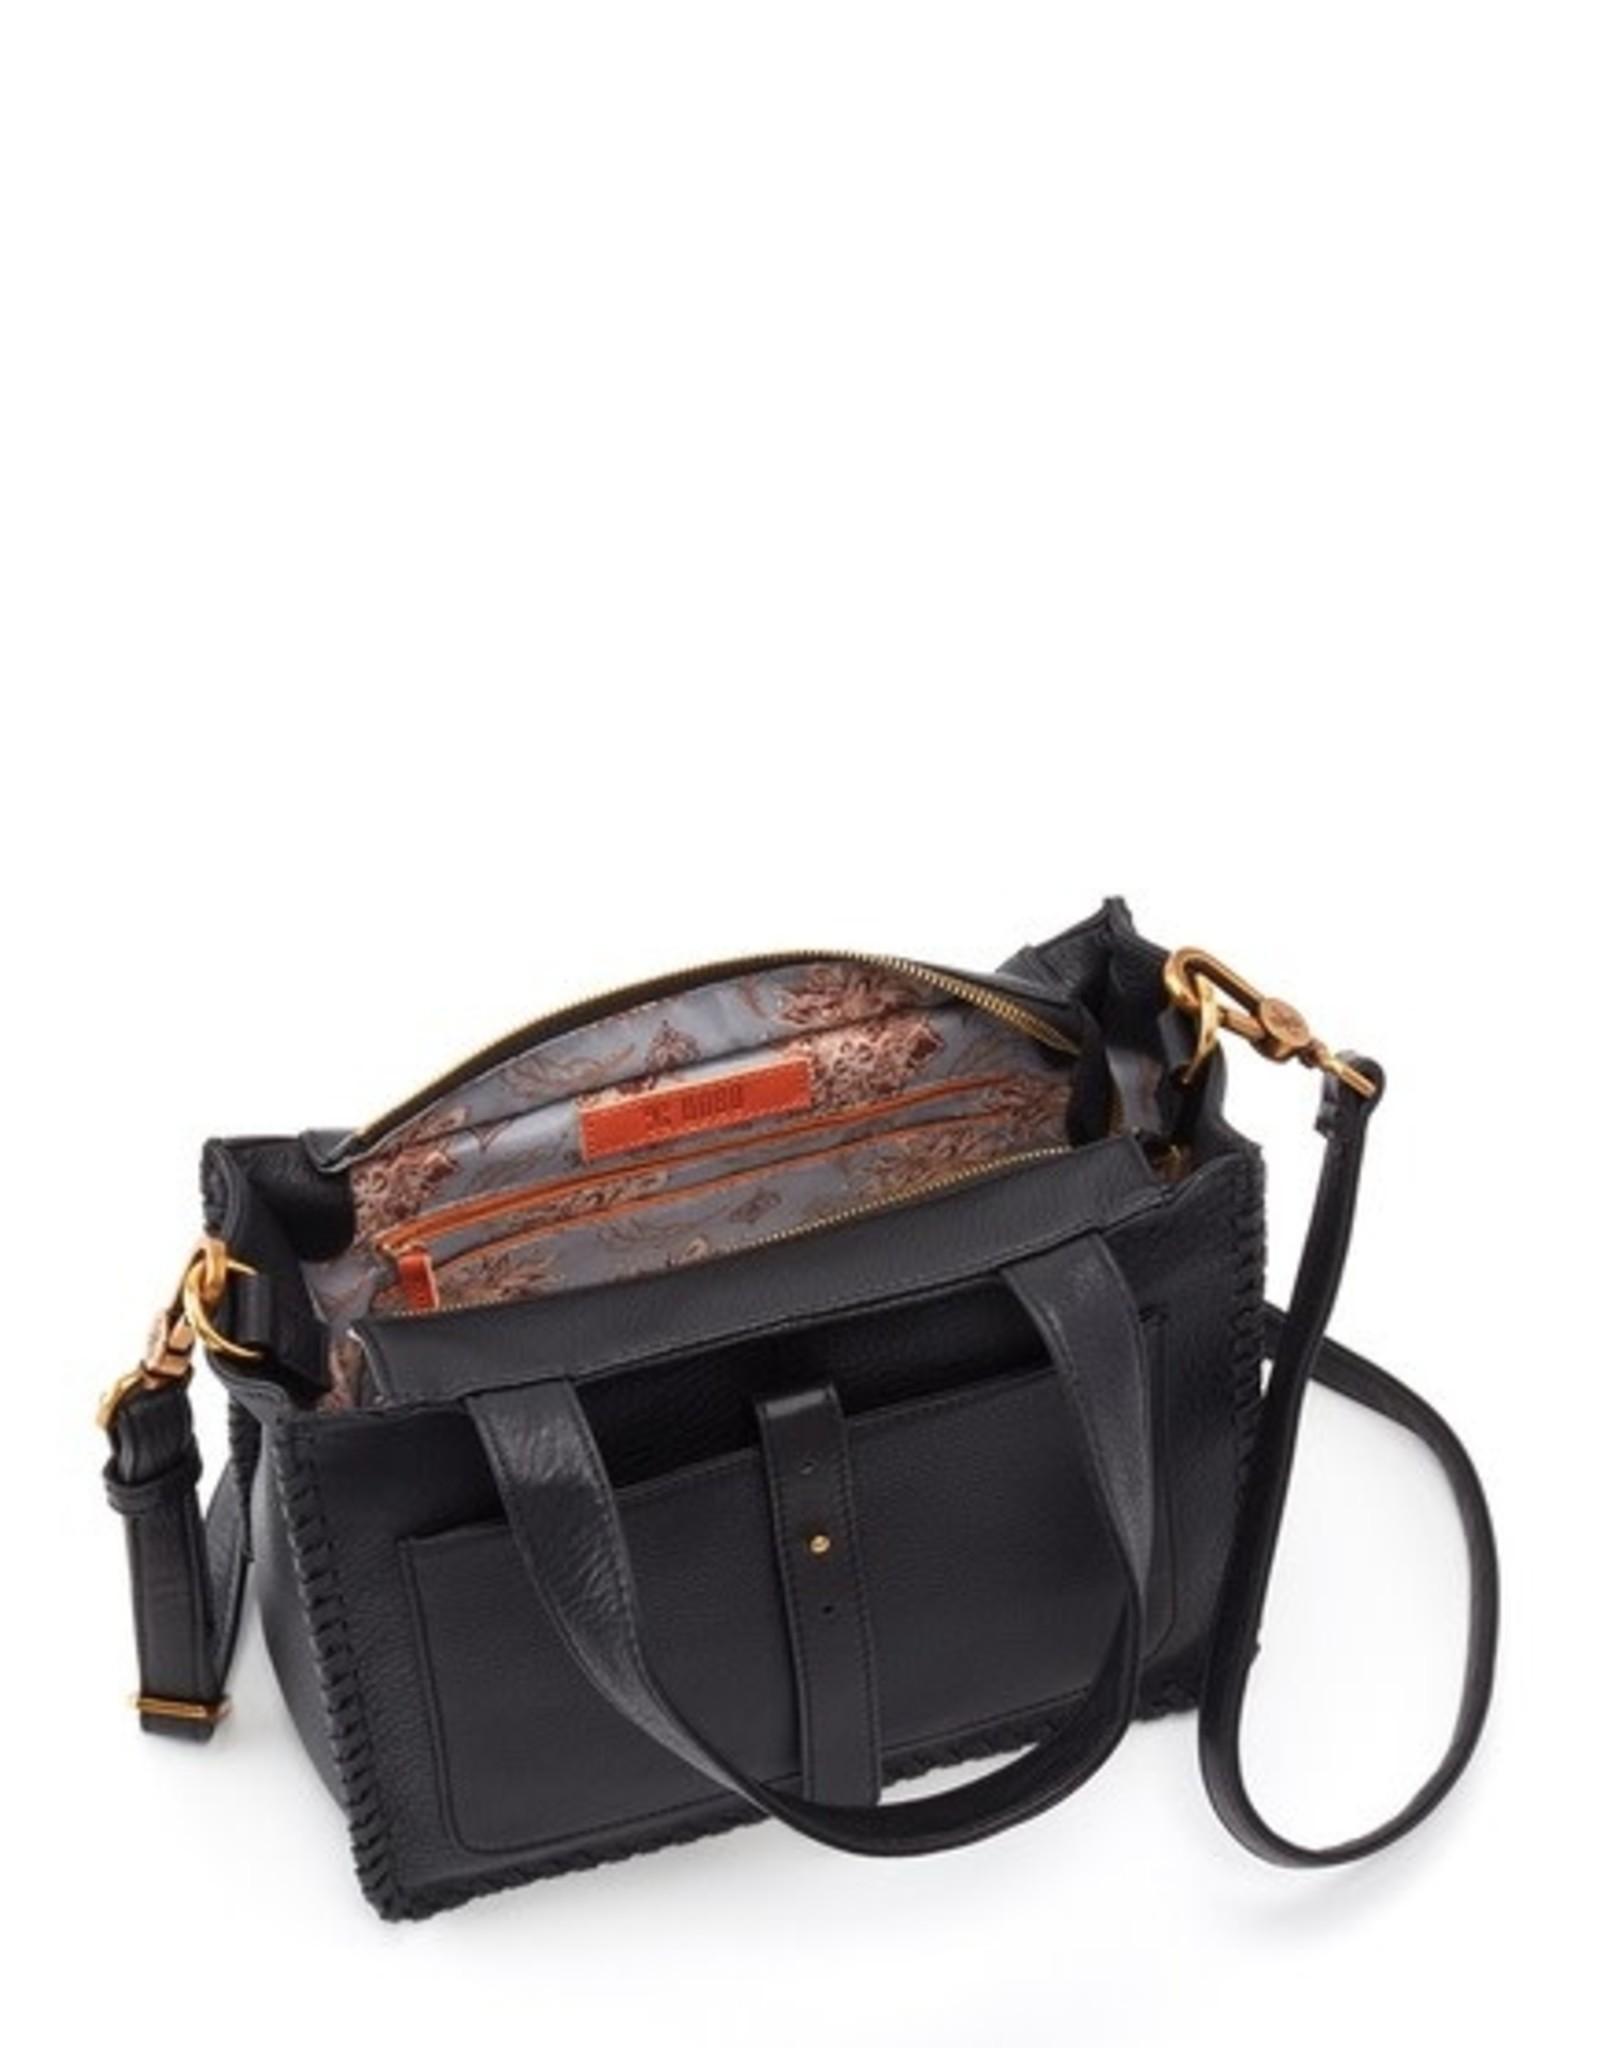 HOBO Domino Crossbody Handbag